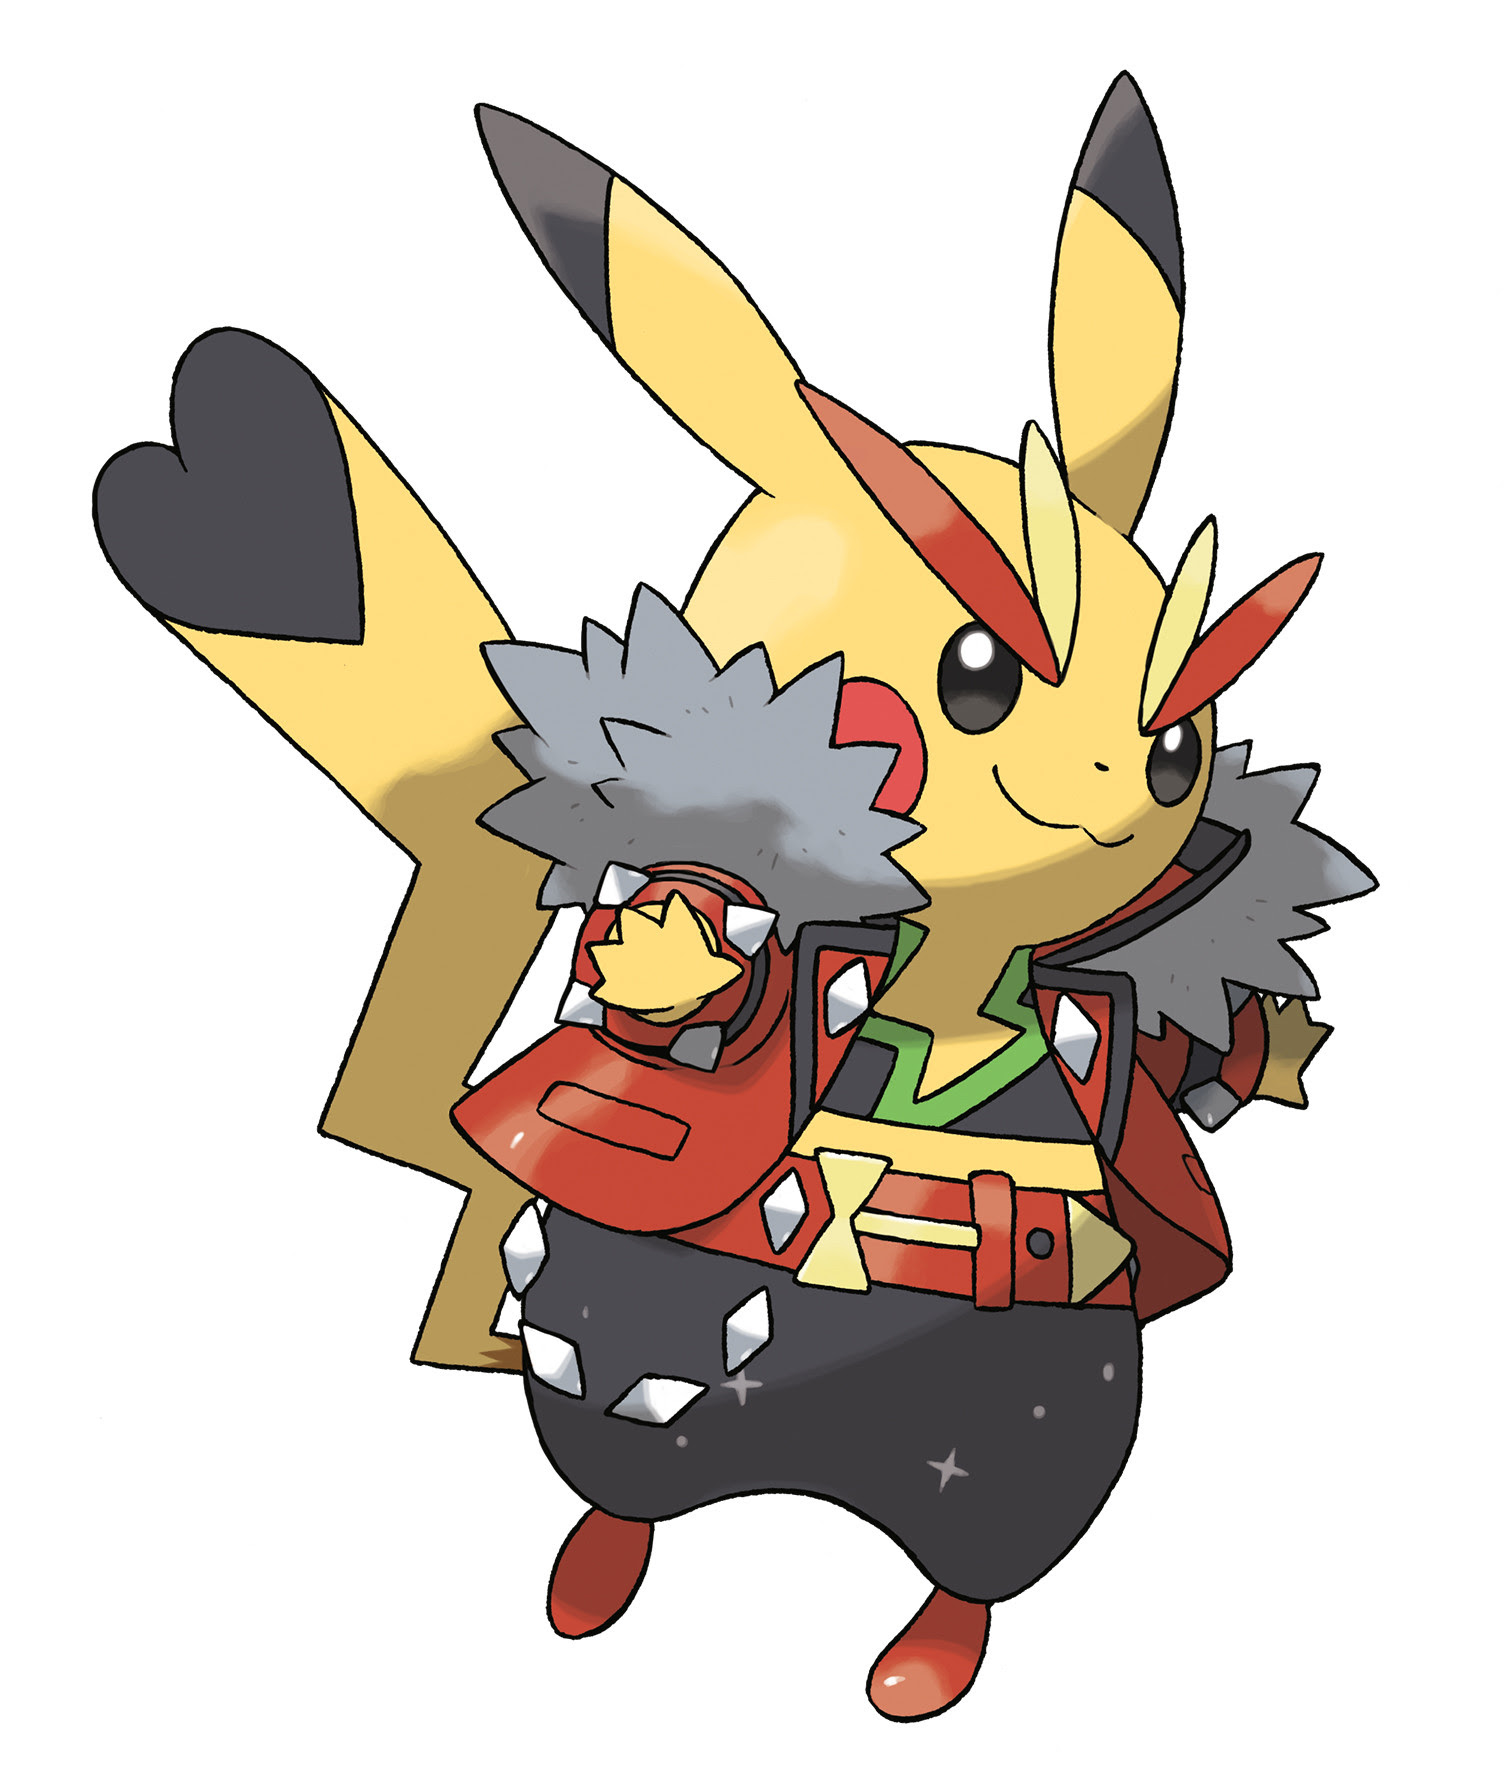 Pokemon's newest mega evolution, Metagross, is the most